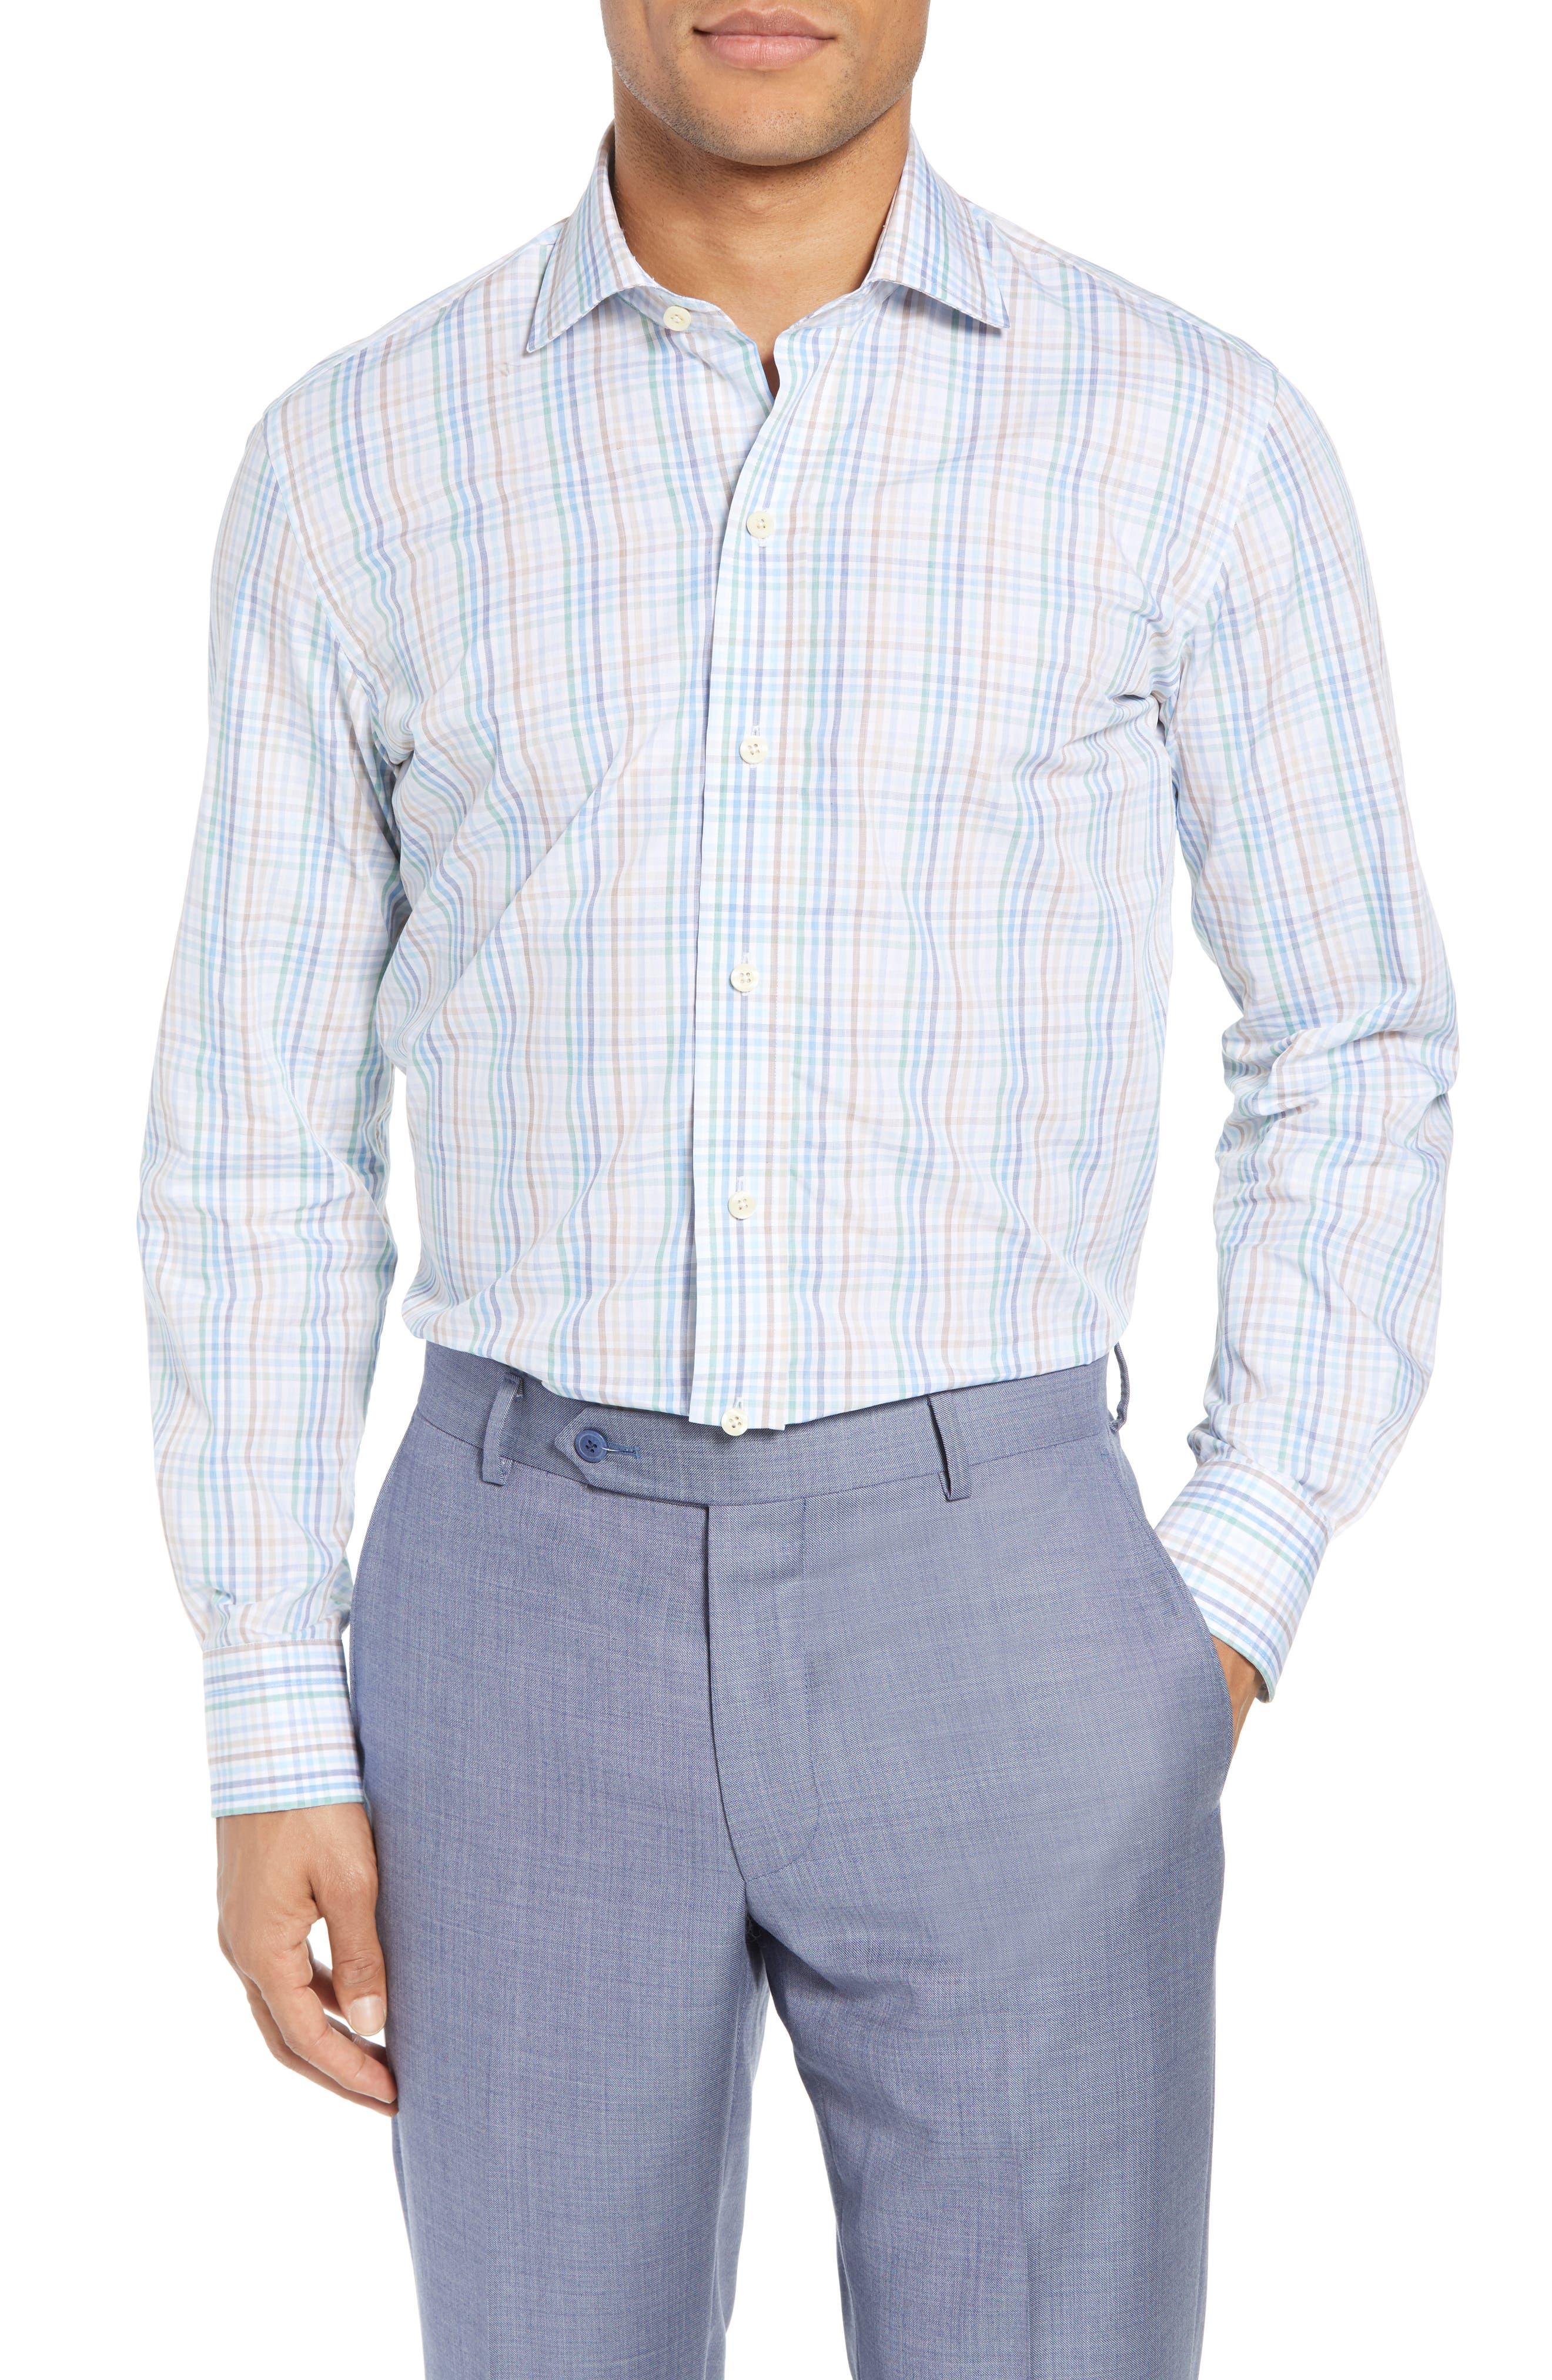 Main Image - Ledbury Albright Slim Fit Check Dress Shirt